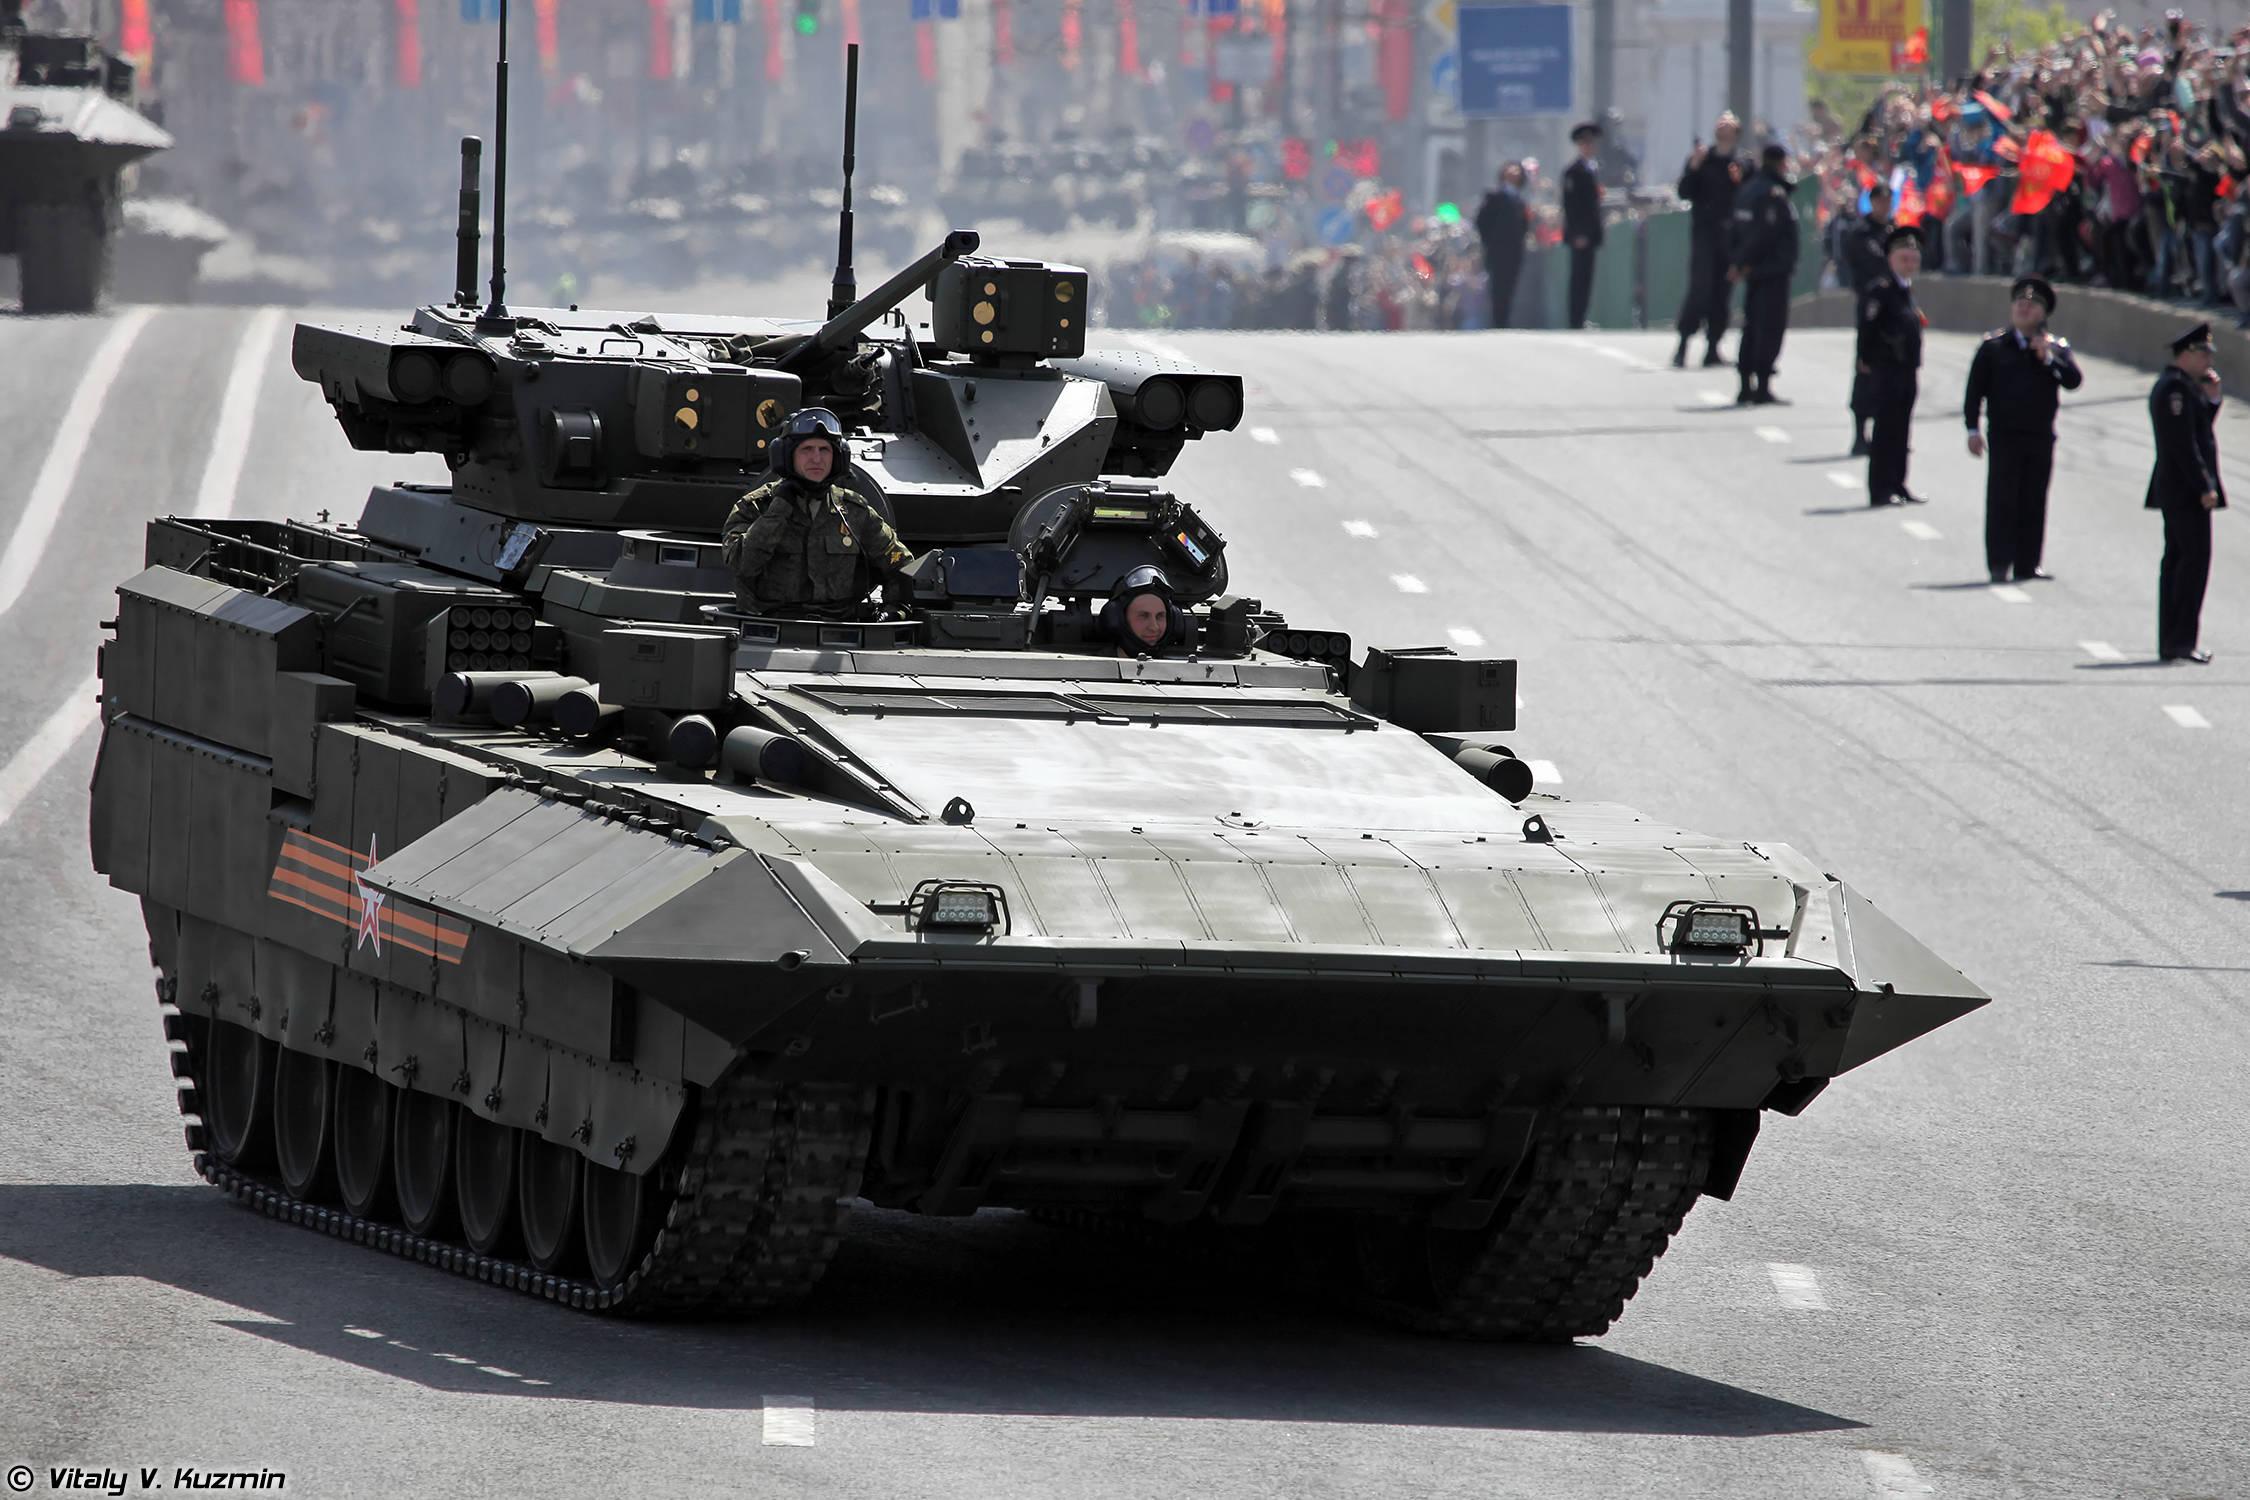 https://tanksdb.ru/images/photos/t-15/tanksdb.ru_t-15_01.jpg